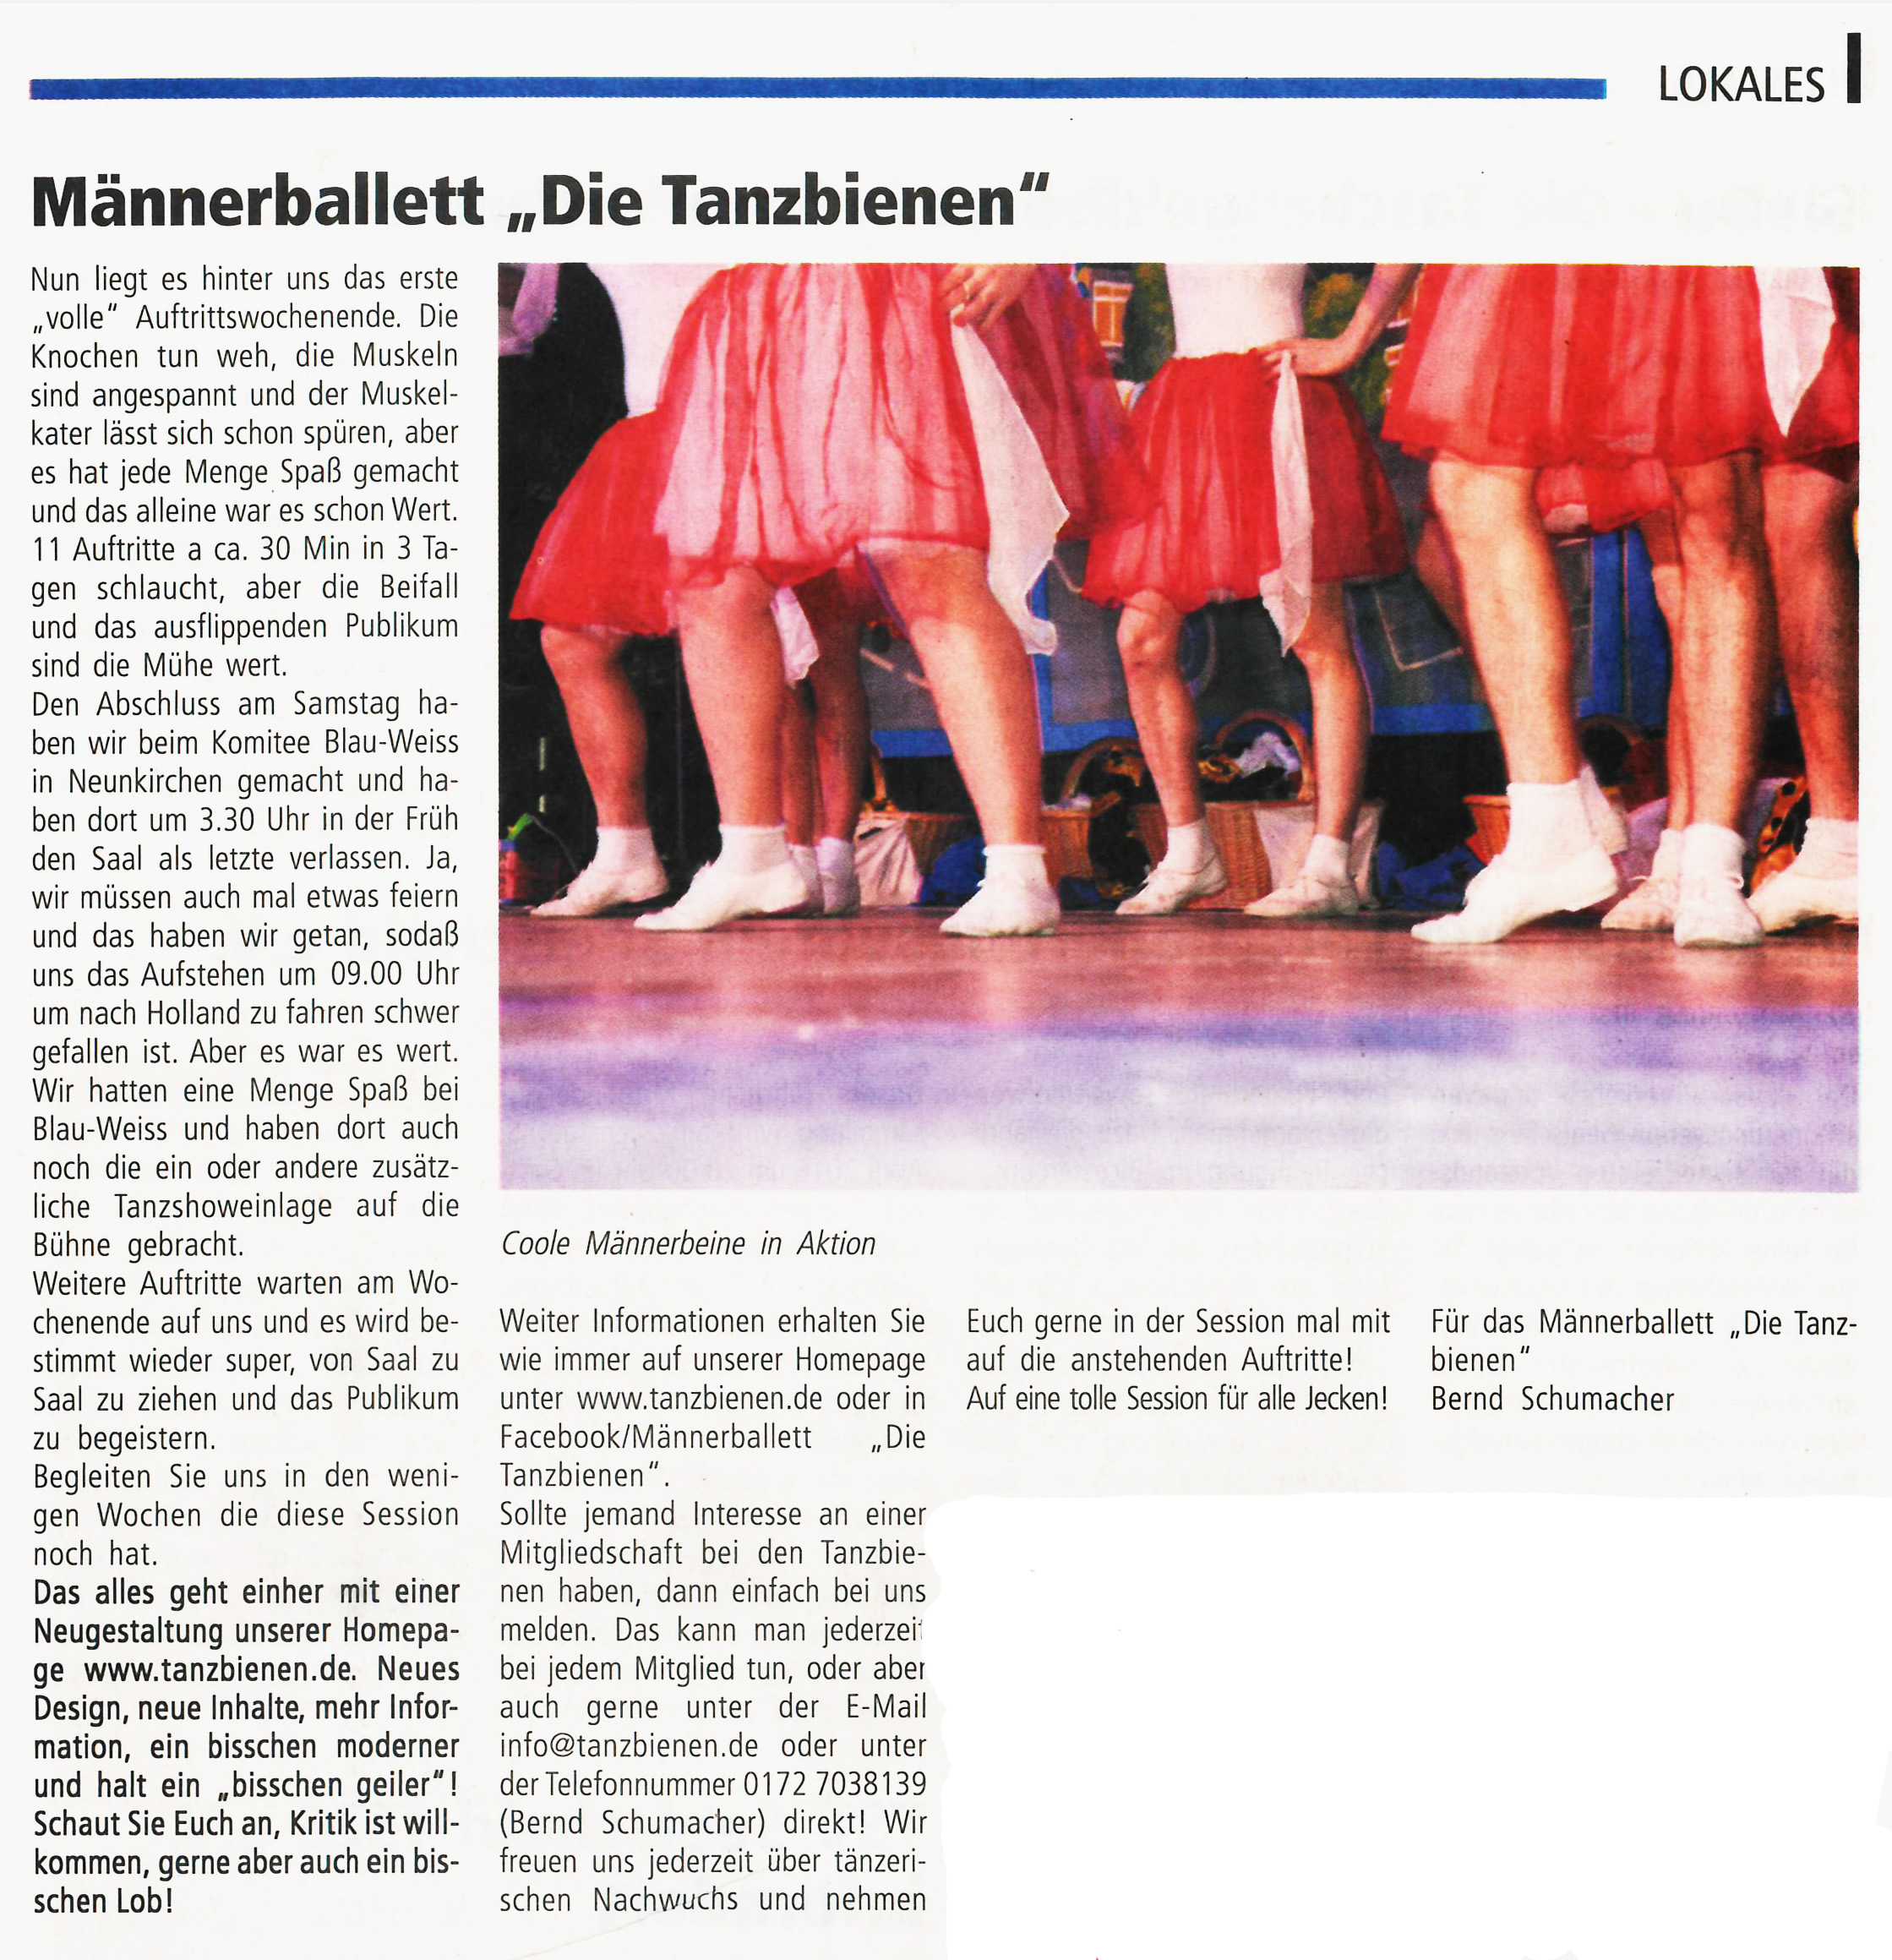 2016-01-18 Amtsblatt Eigener Bericht